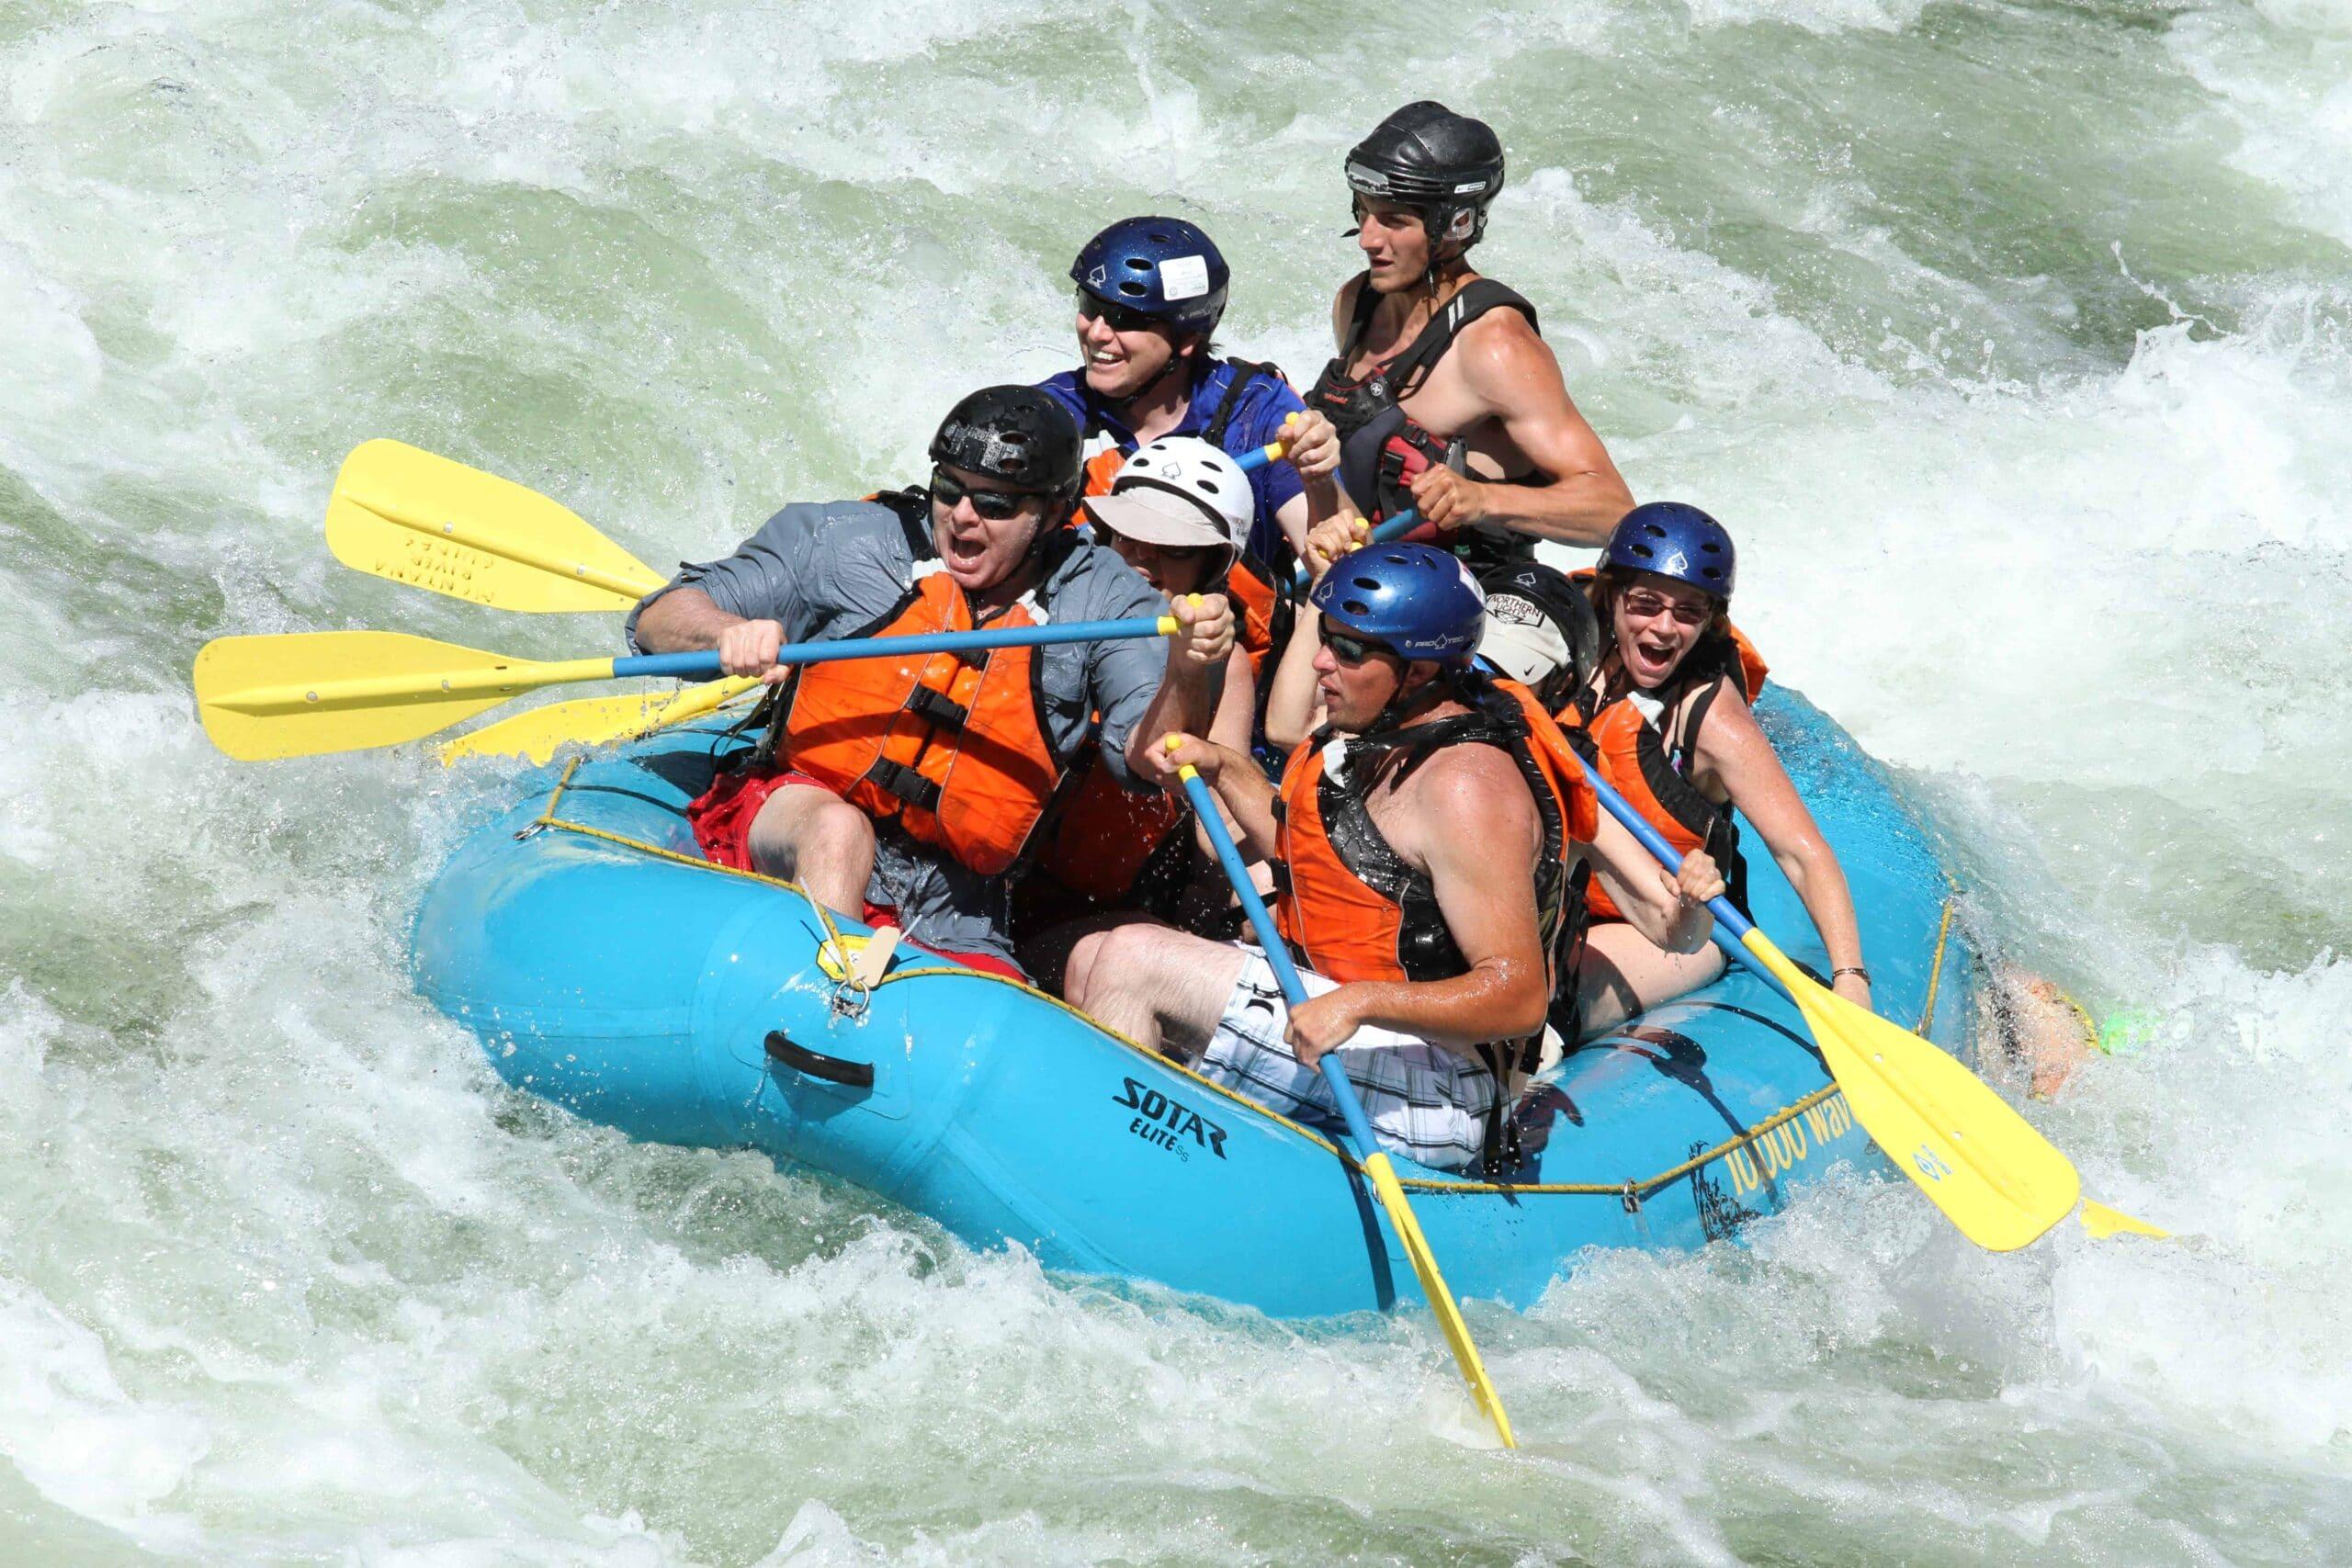 Missoula rafting adventure on the Clark Fork River near Missoula